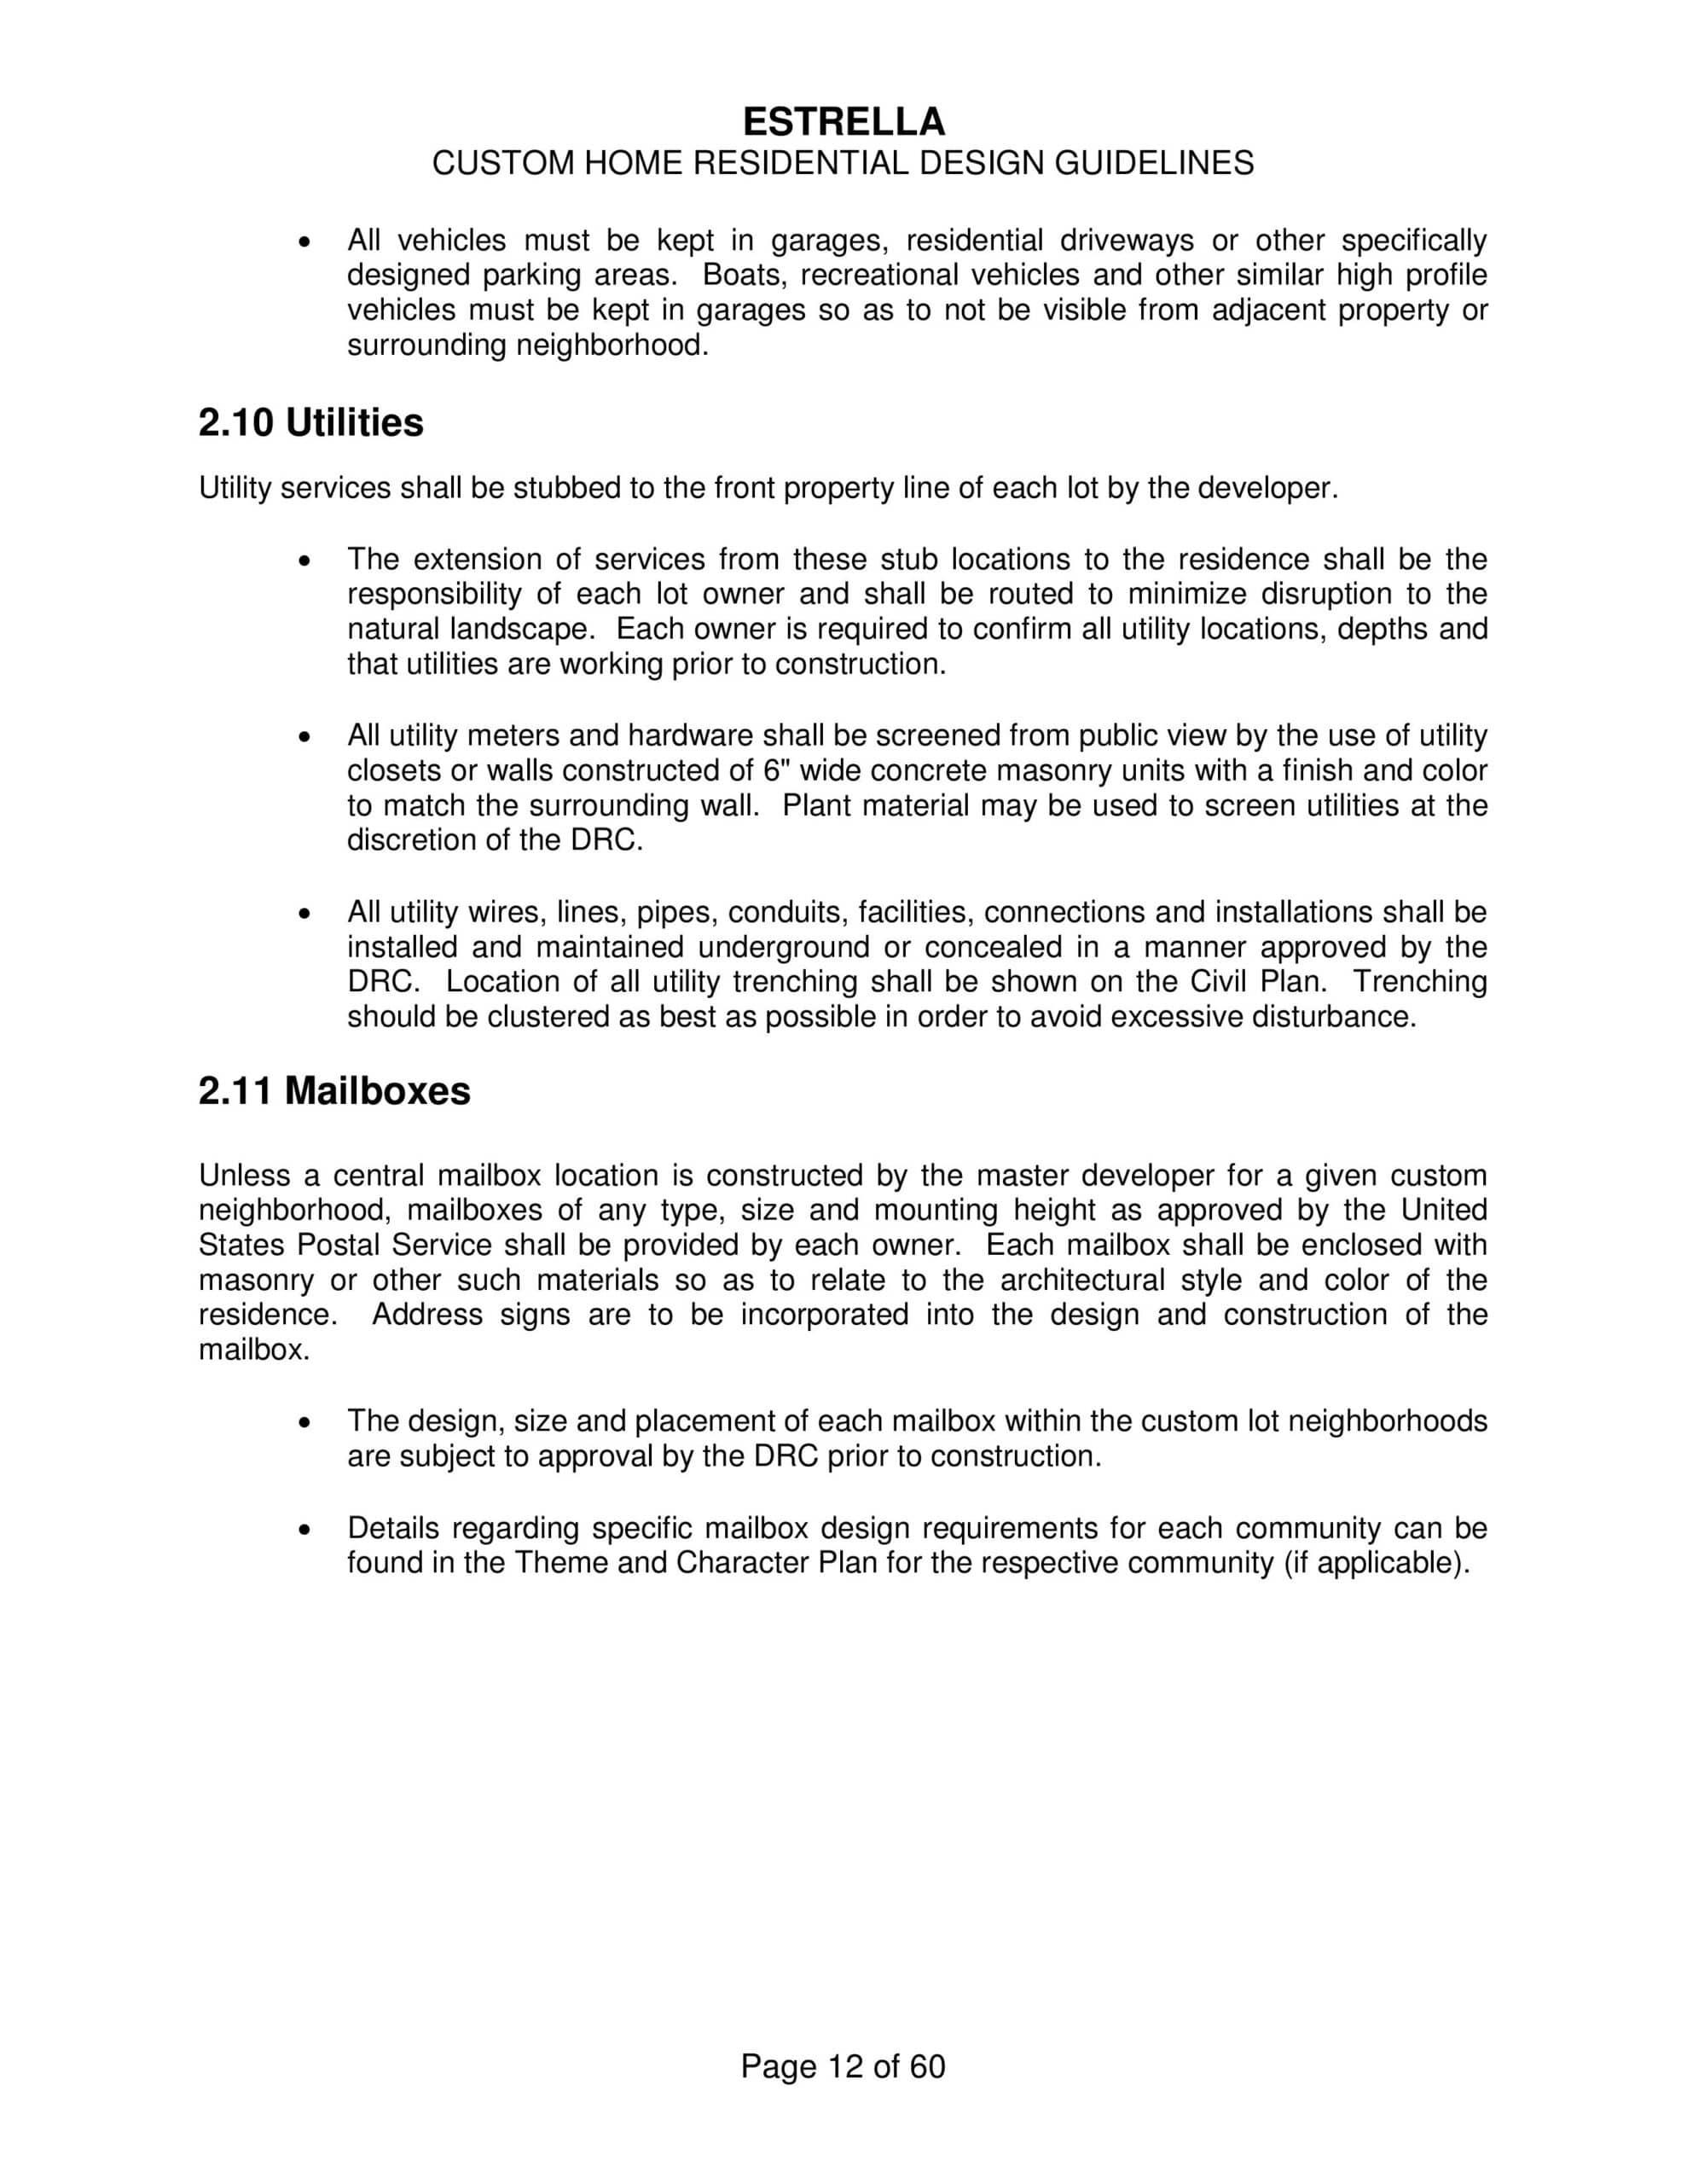 ESTRELLA MOUNTAIN CUSTOM HOME GUIDELINES-page-016